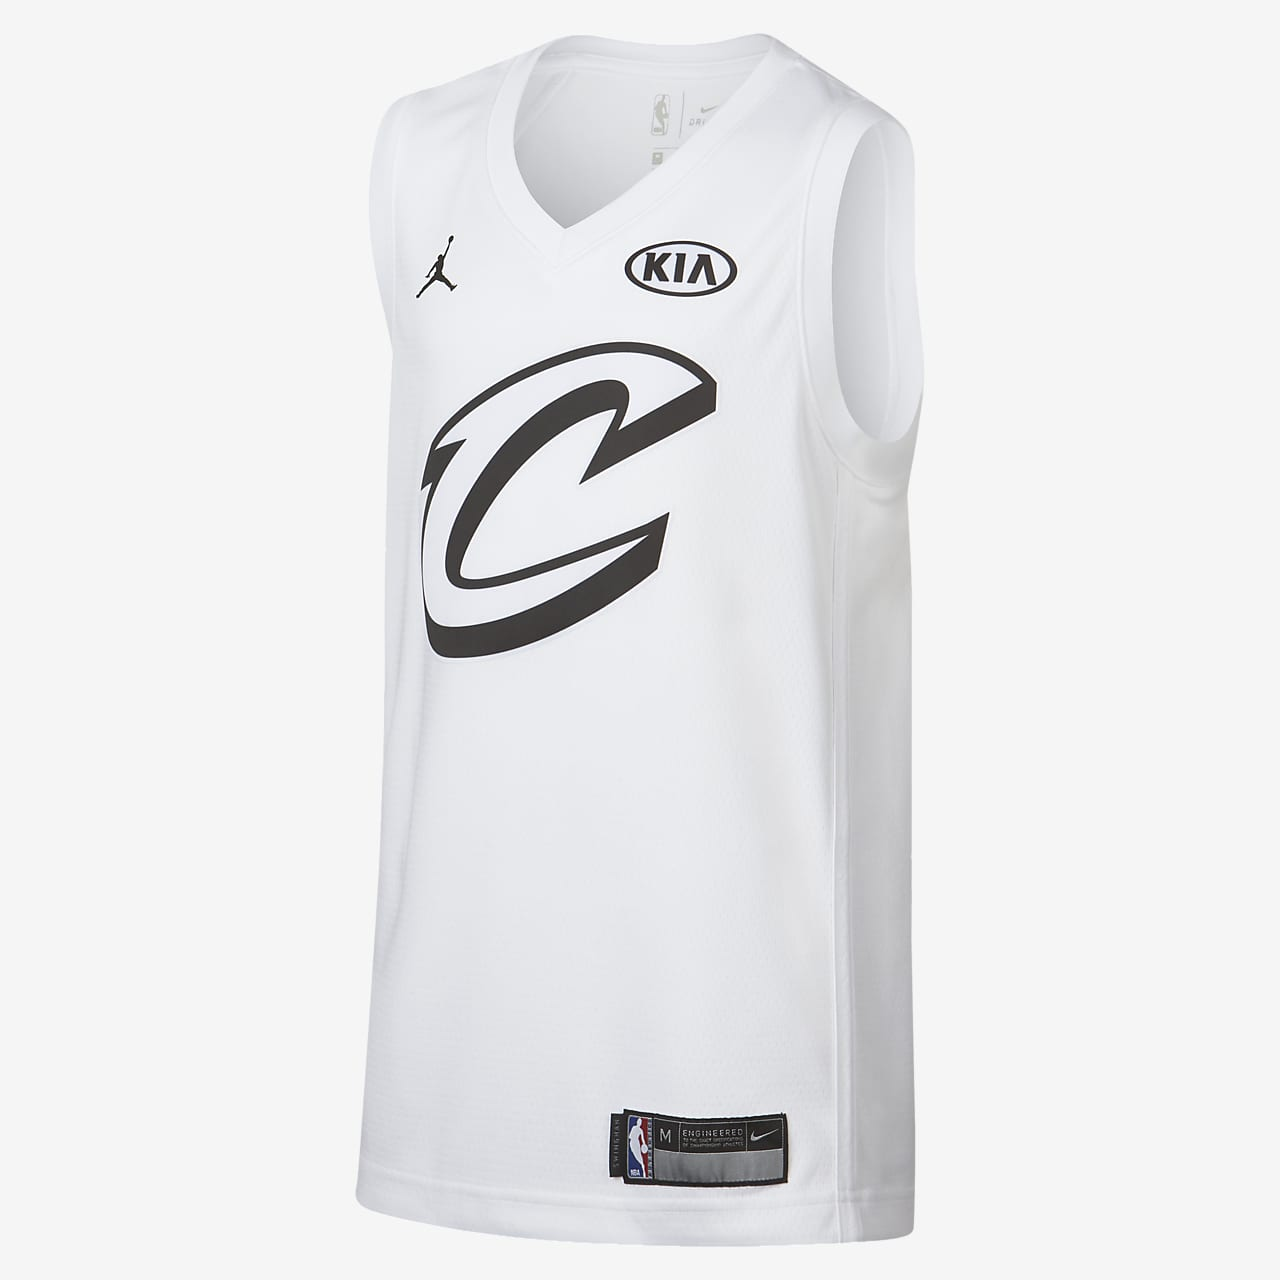 LeBron James All-Star Edition Swingman Jersey Older Kids' Jordan NBA Connected Jersey